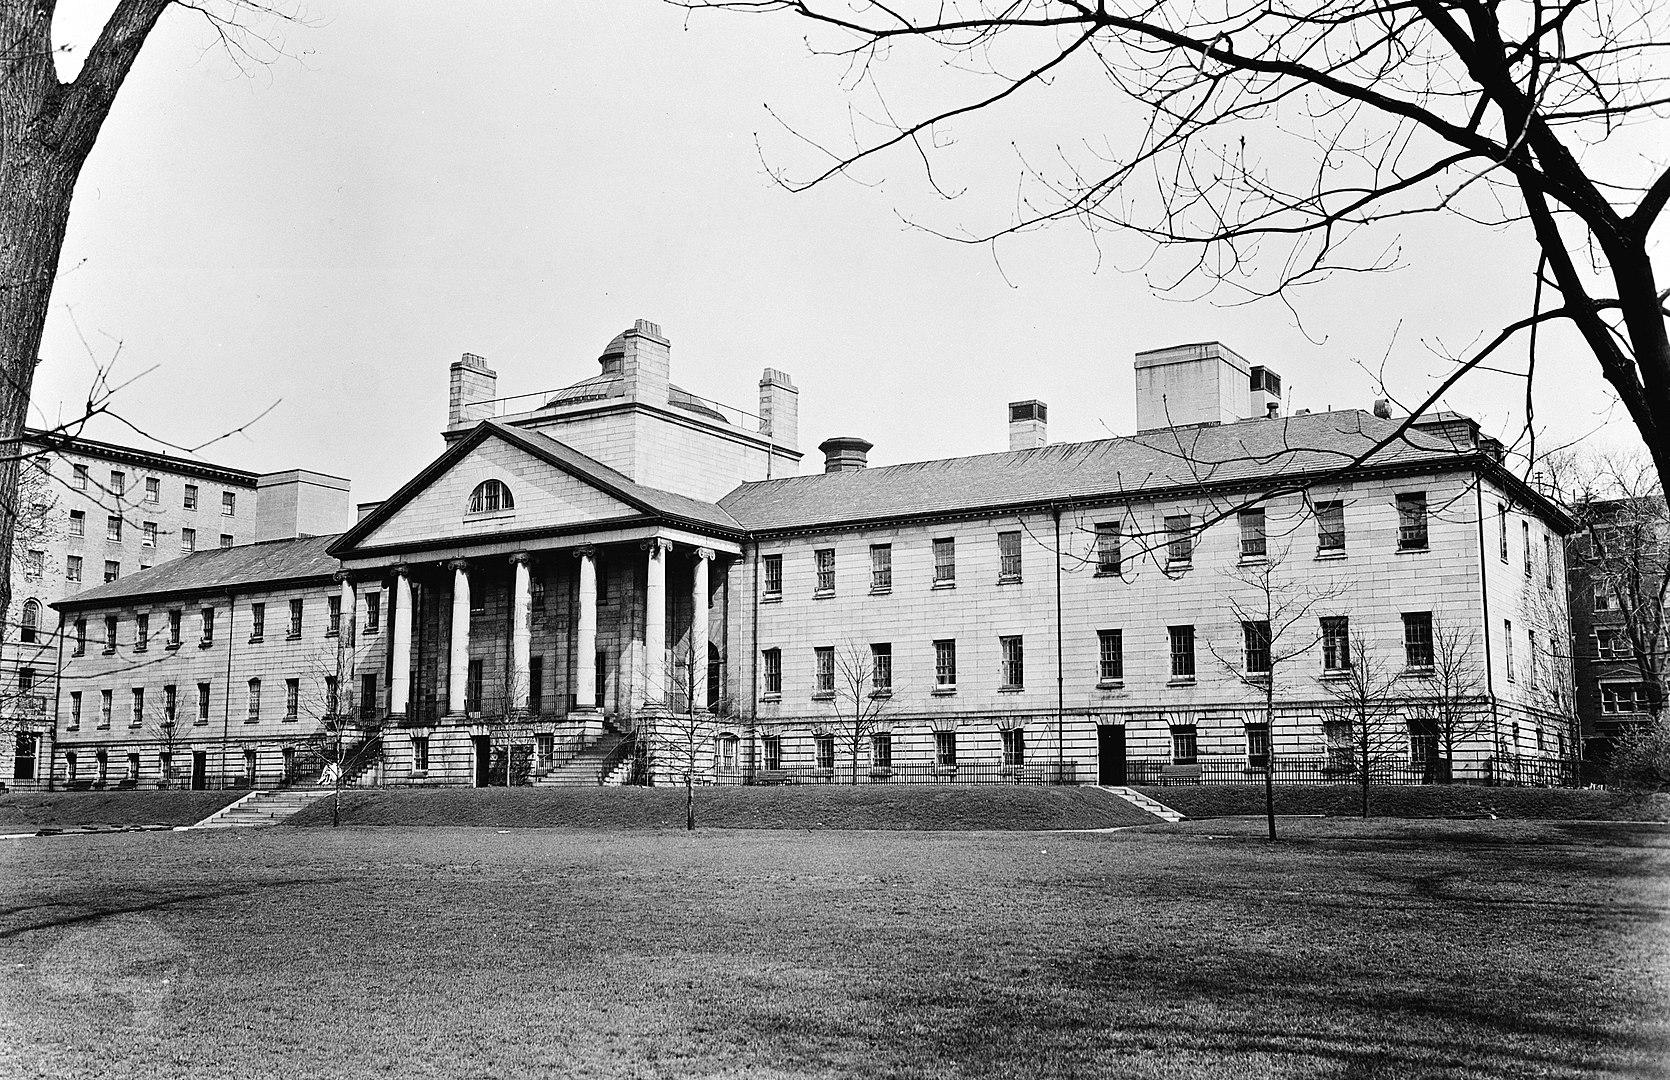 Massachussetts General Hospital